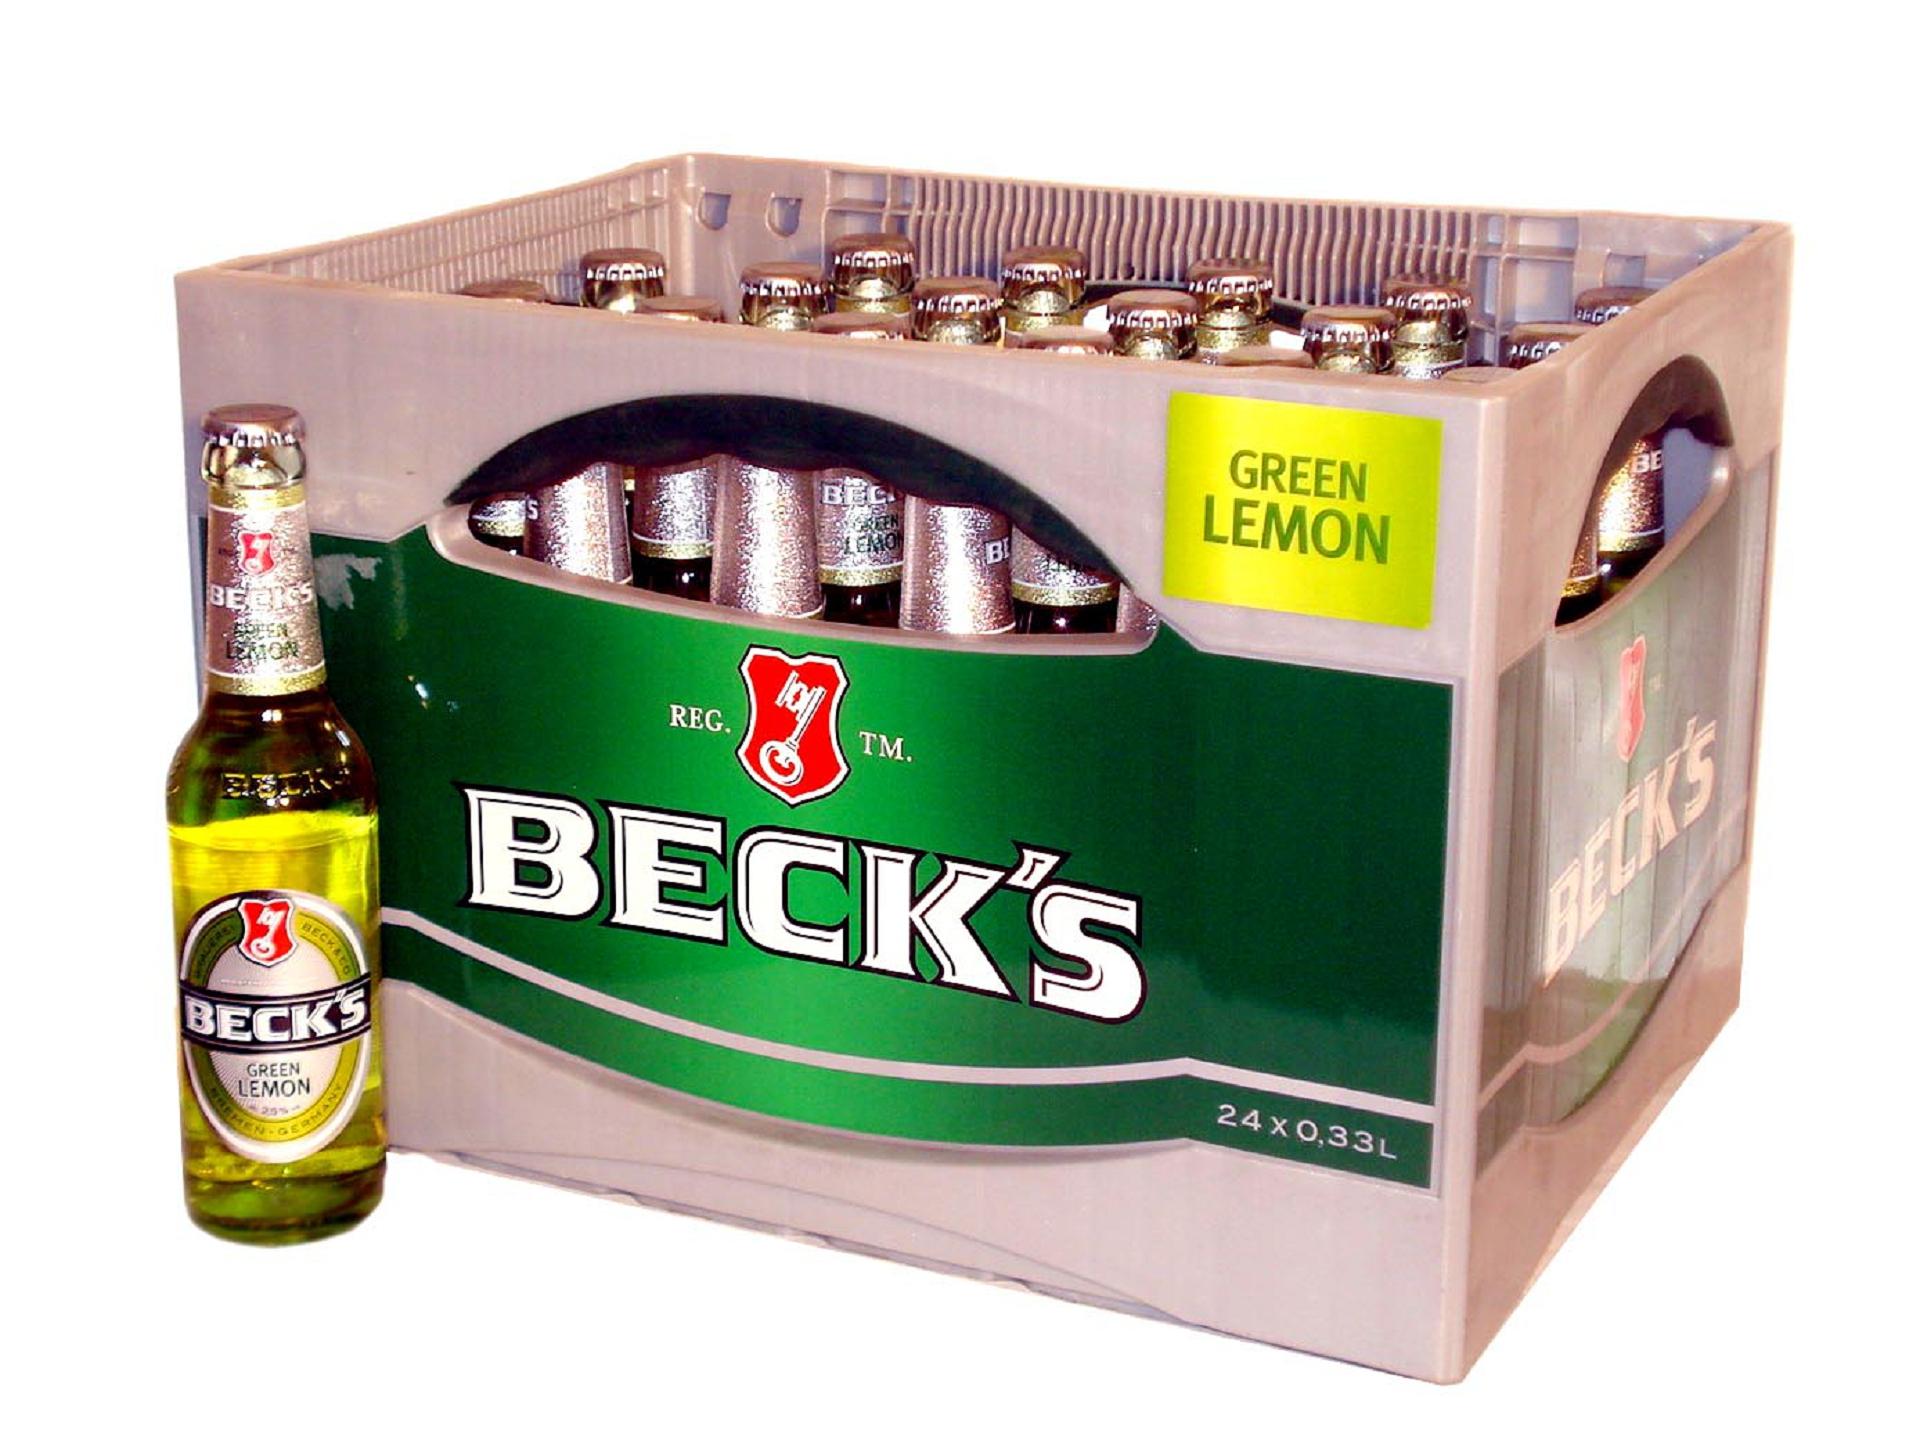 Becks Images